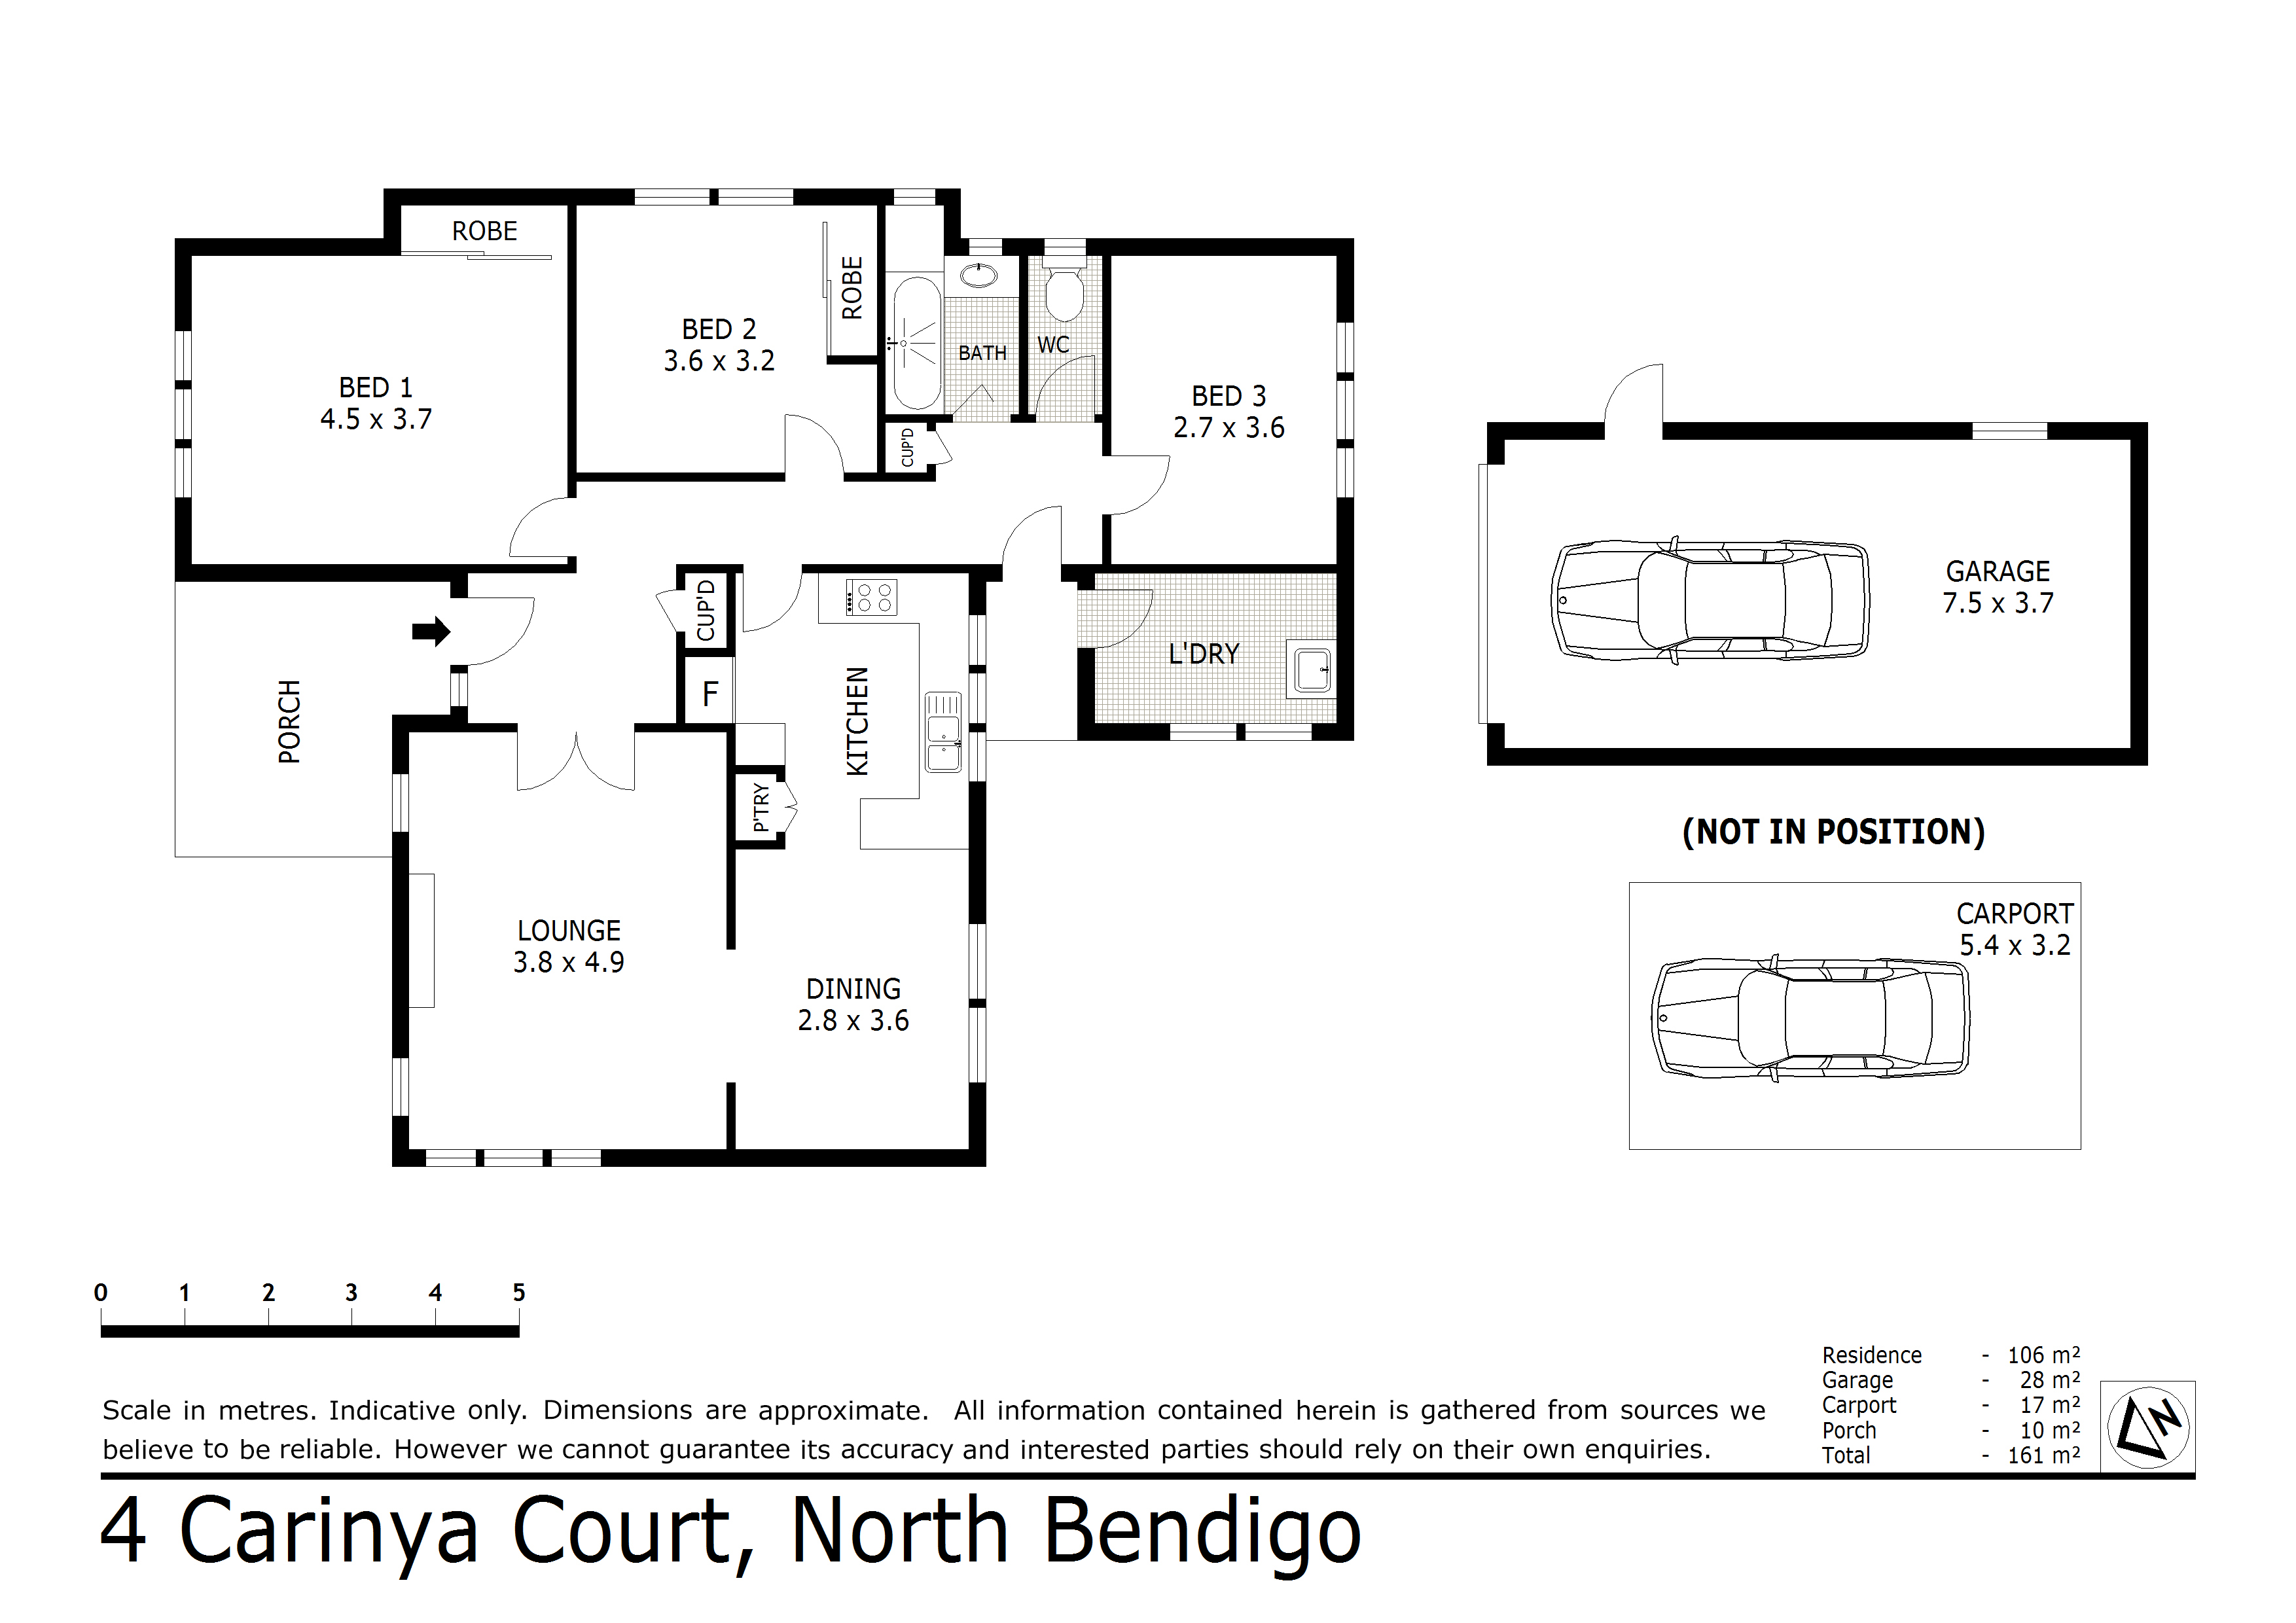 4 Carinya Court, North Bendigo, VIC 3550